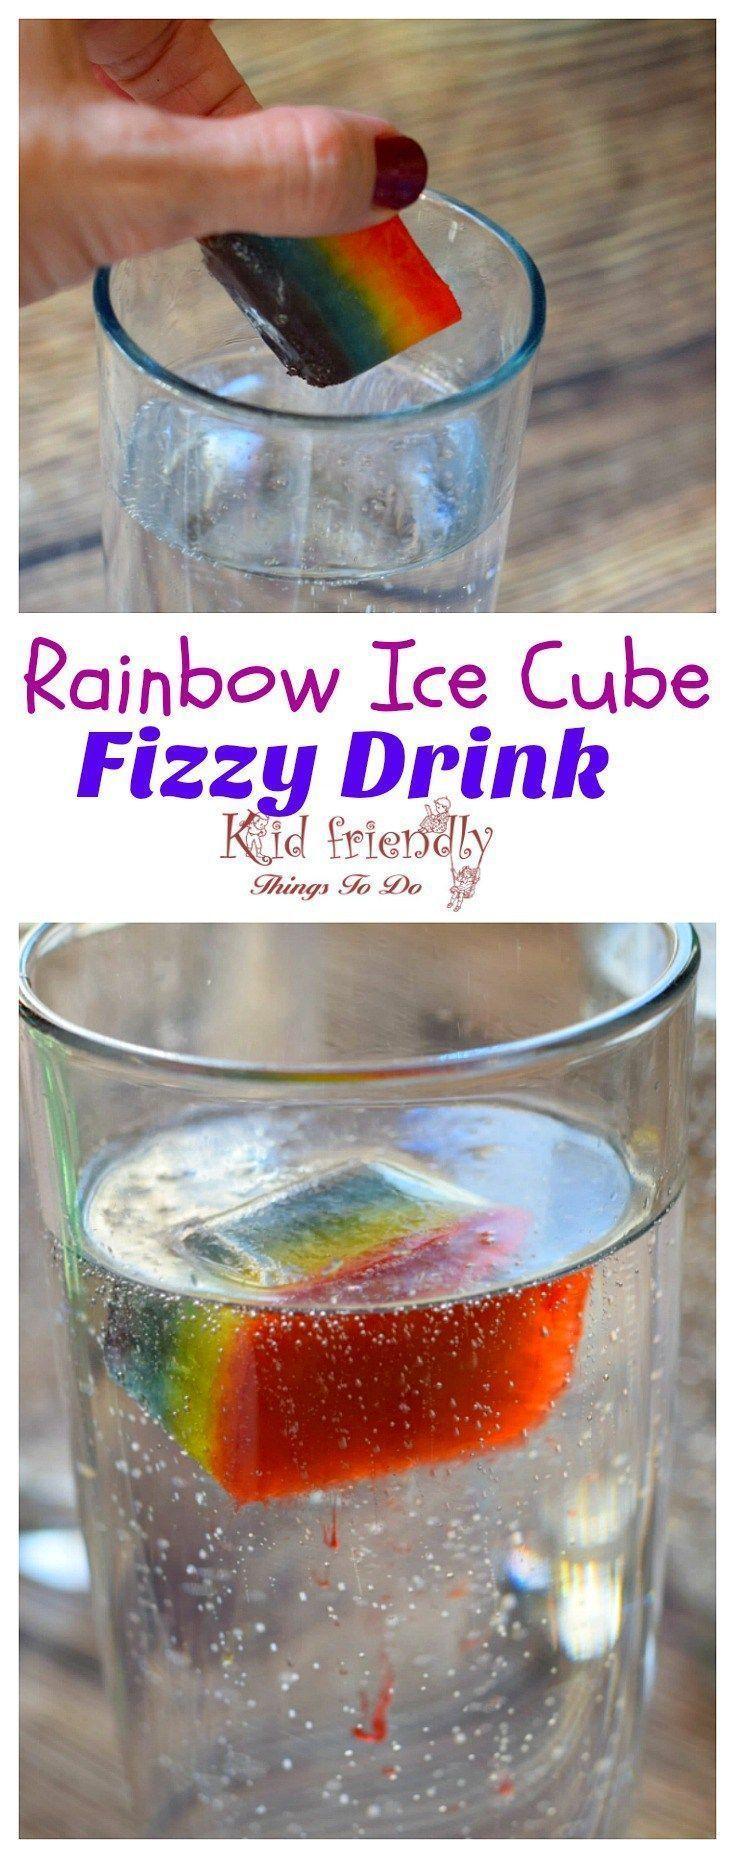 Rainbow Fizzy Drinks a fun idea for St. Patrick's Day or just summer fun treats for kids! http://www.kidfriendlythingstodo.com